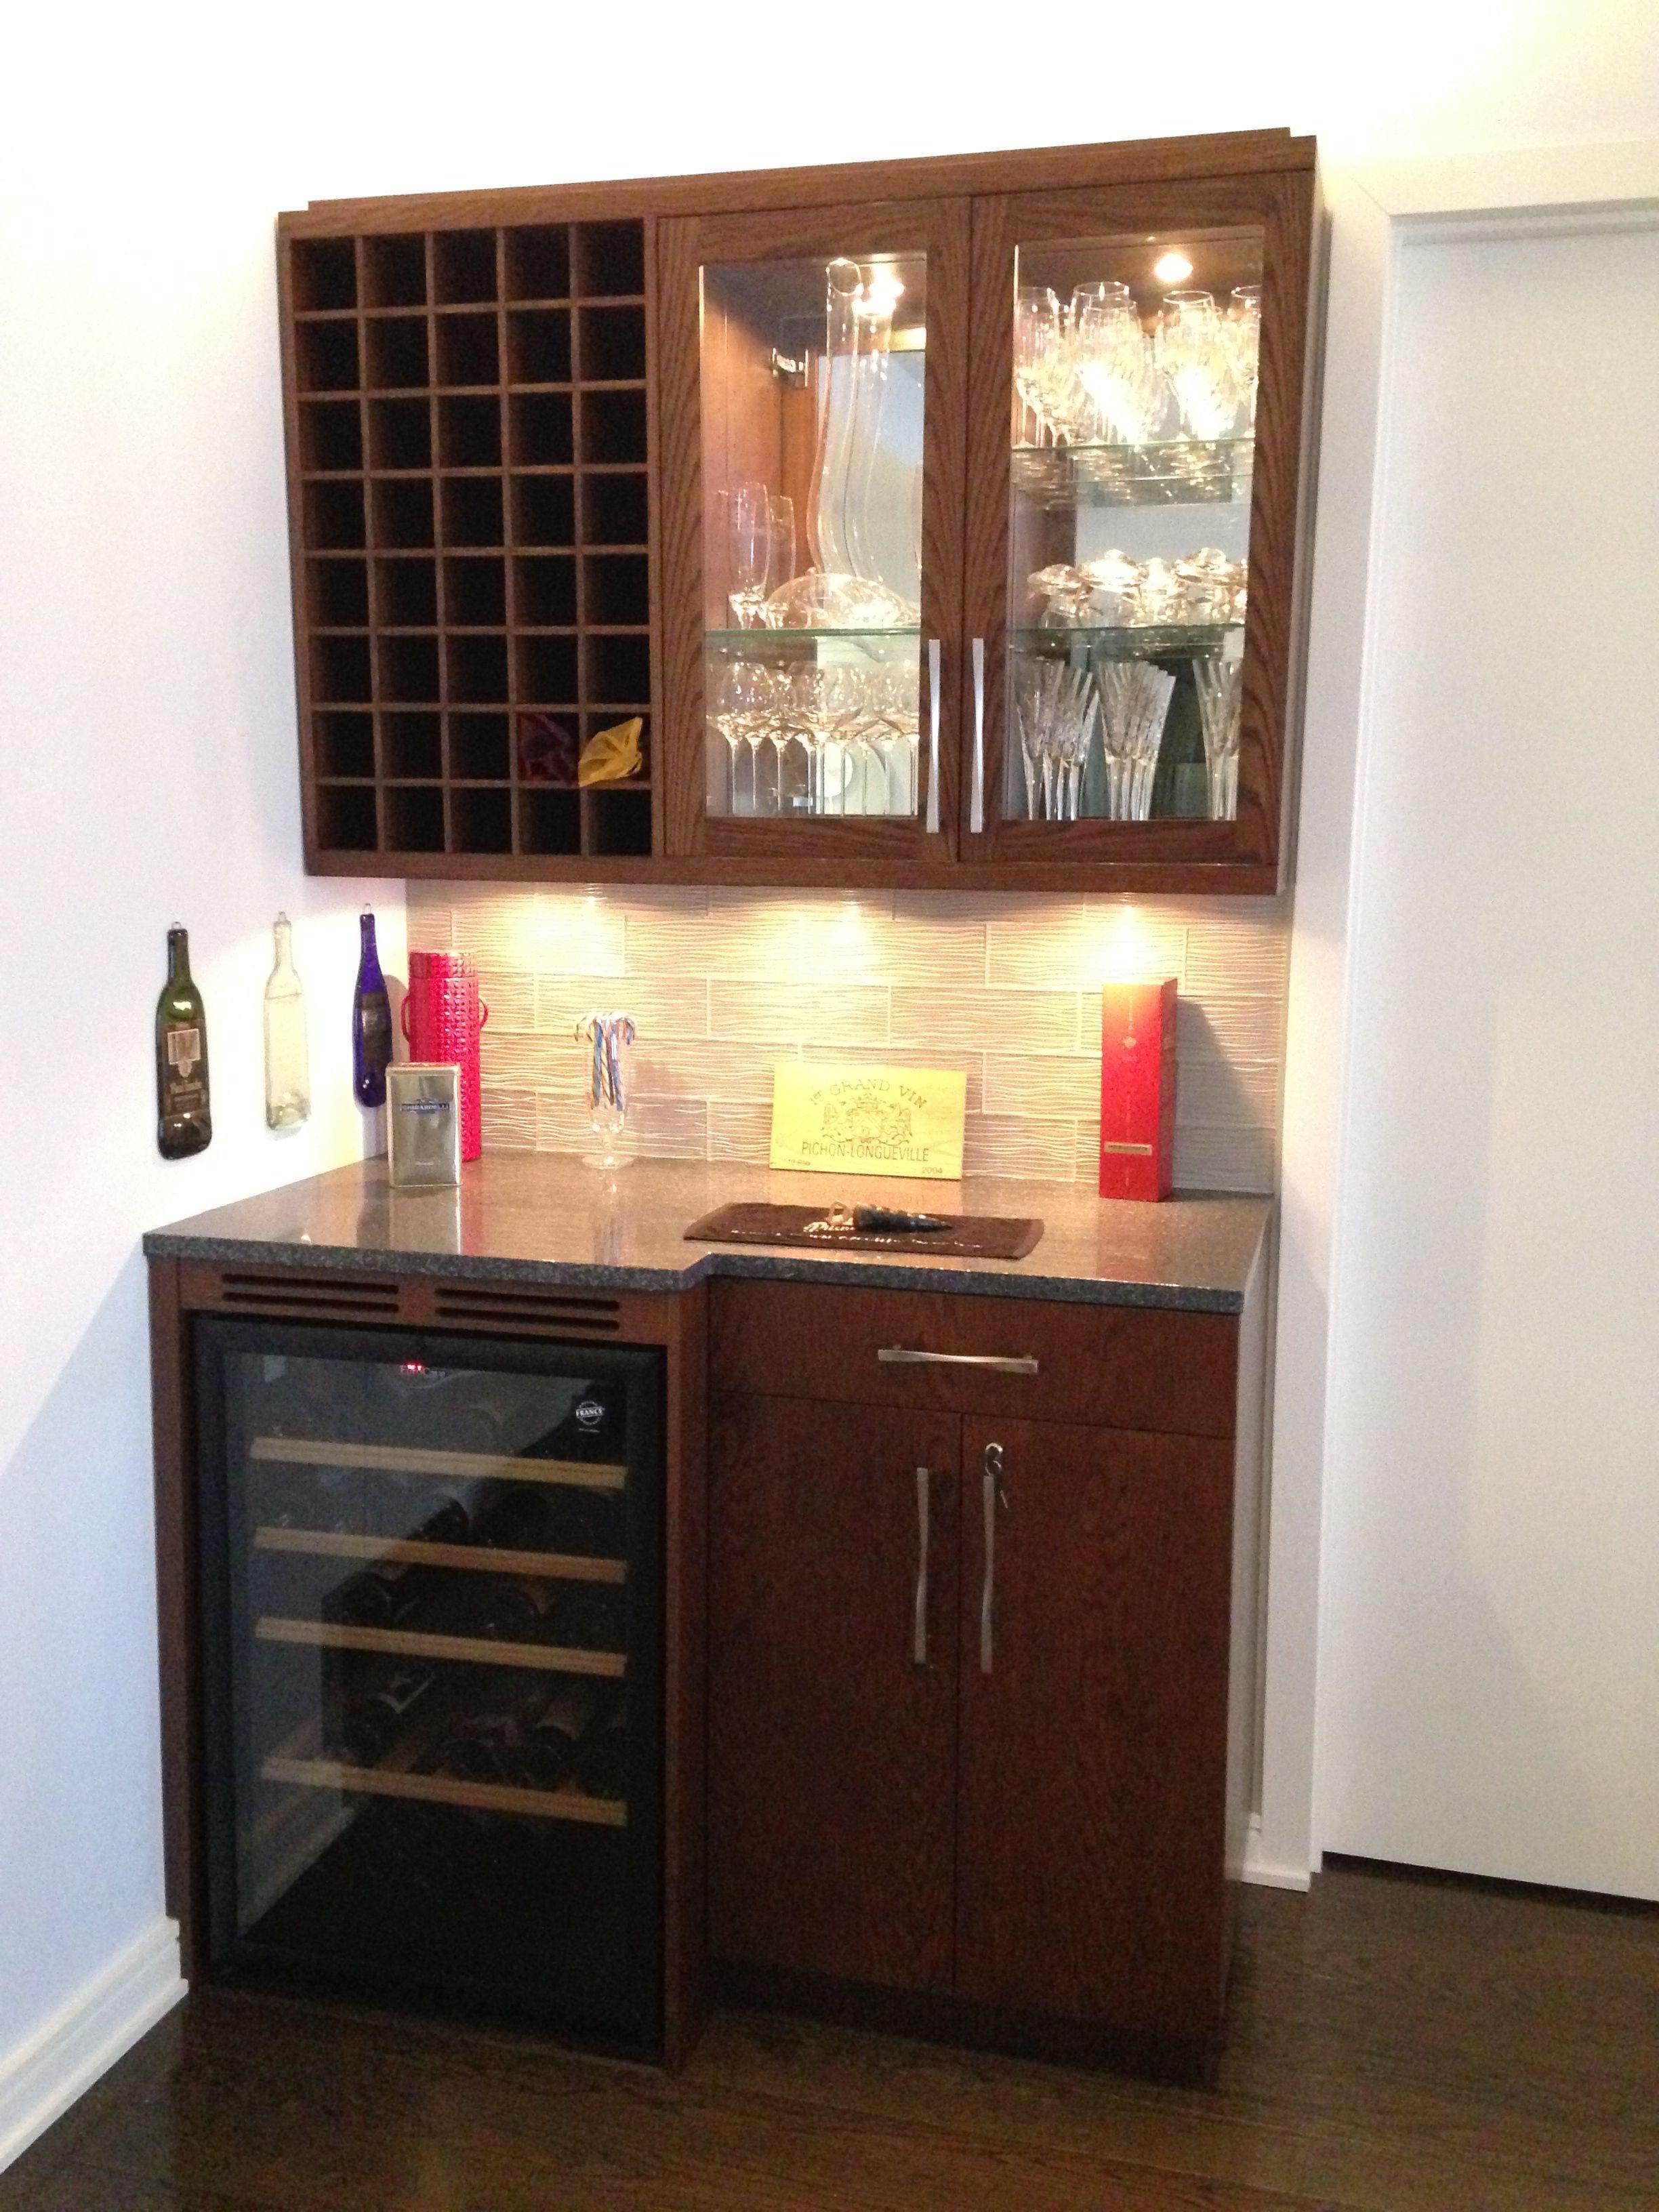 Custom Stained Oak Bar Cabinet Cabinetmakernyc Madeinbrooklyn Oak Bar Kitchendesign Woodworking Custom Kitchen Cabinets Kitchen Cabinets Custom Kitchen